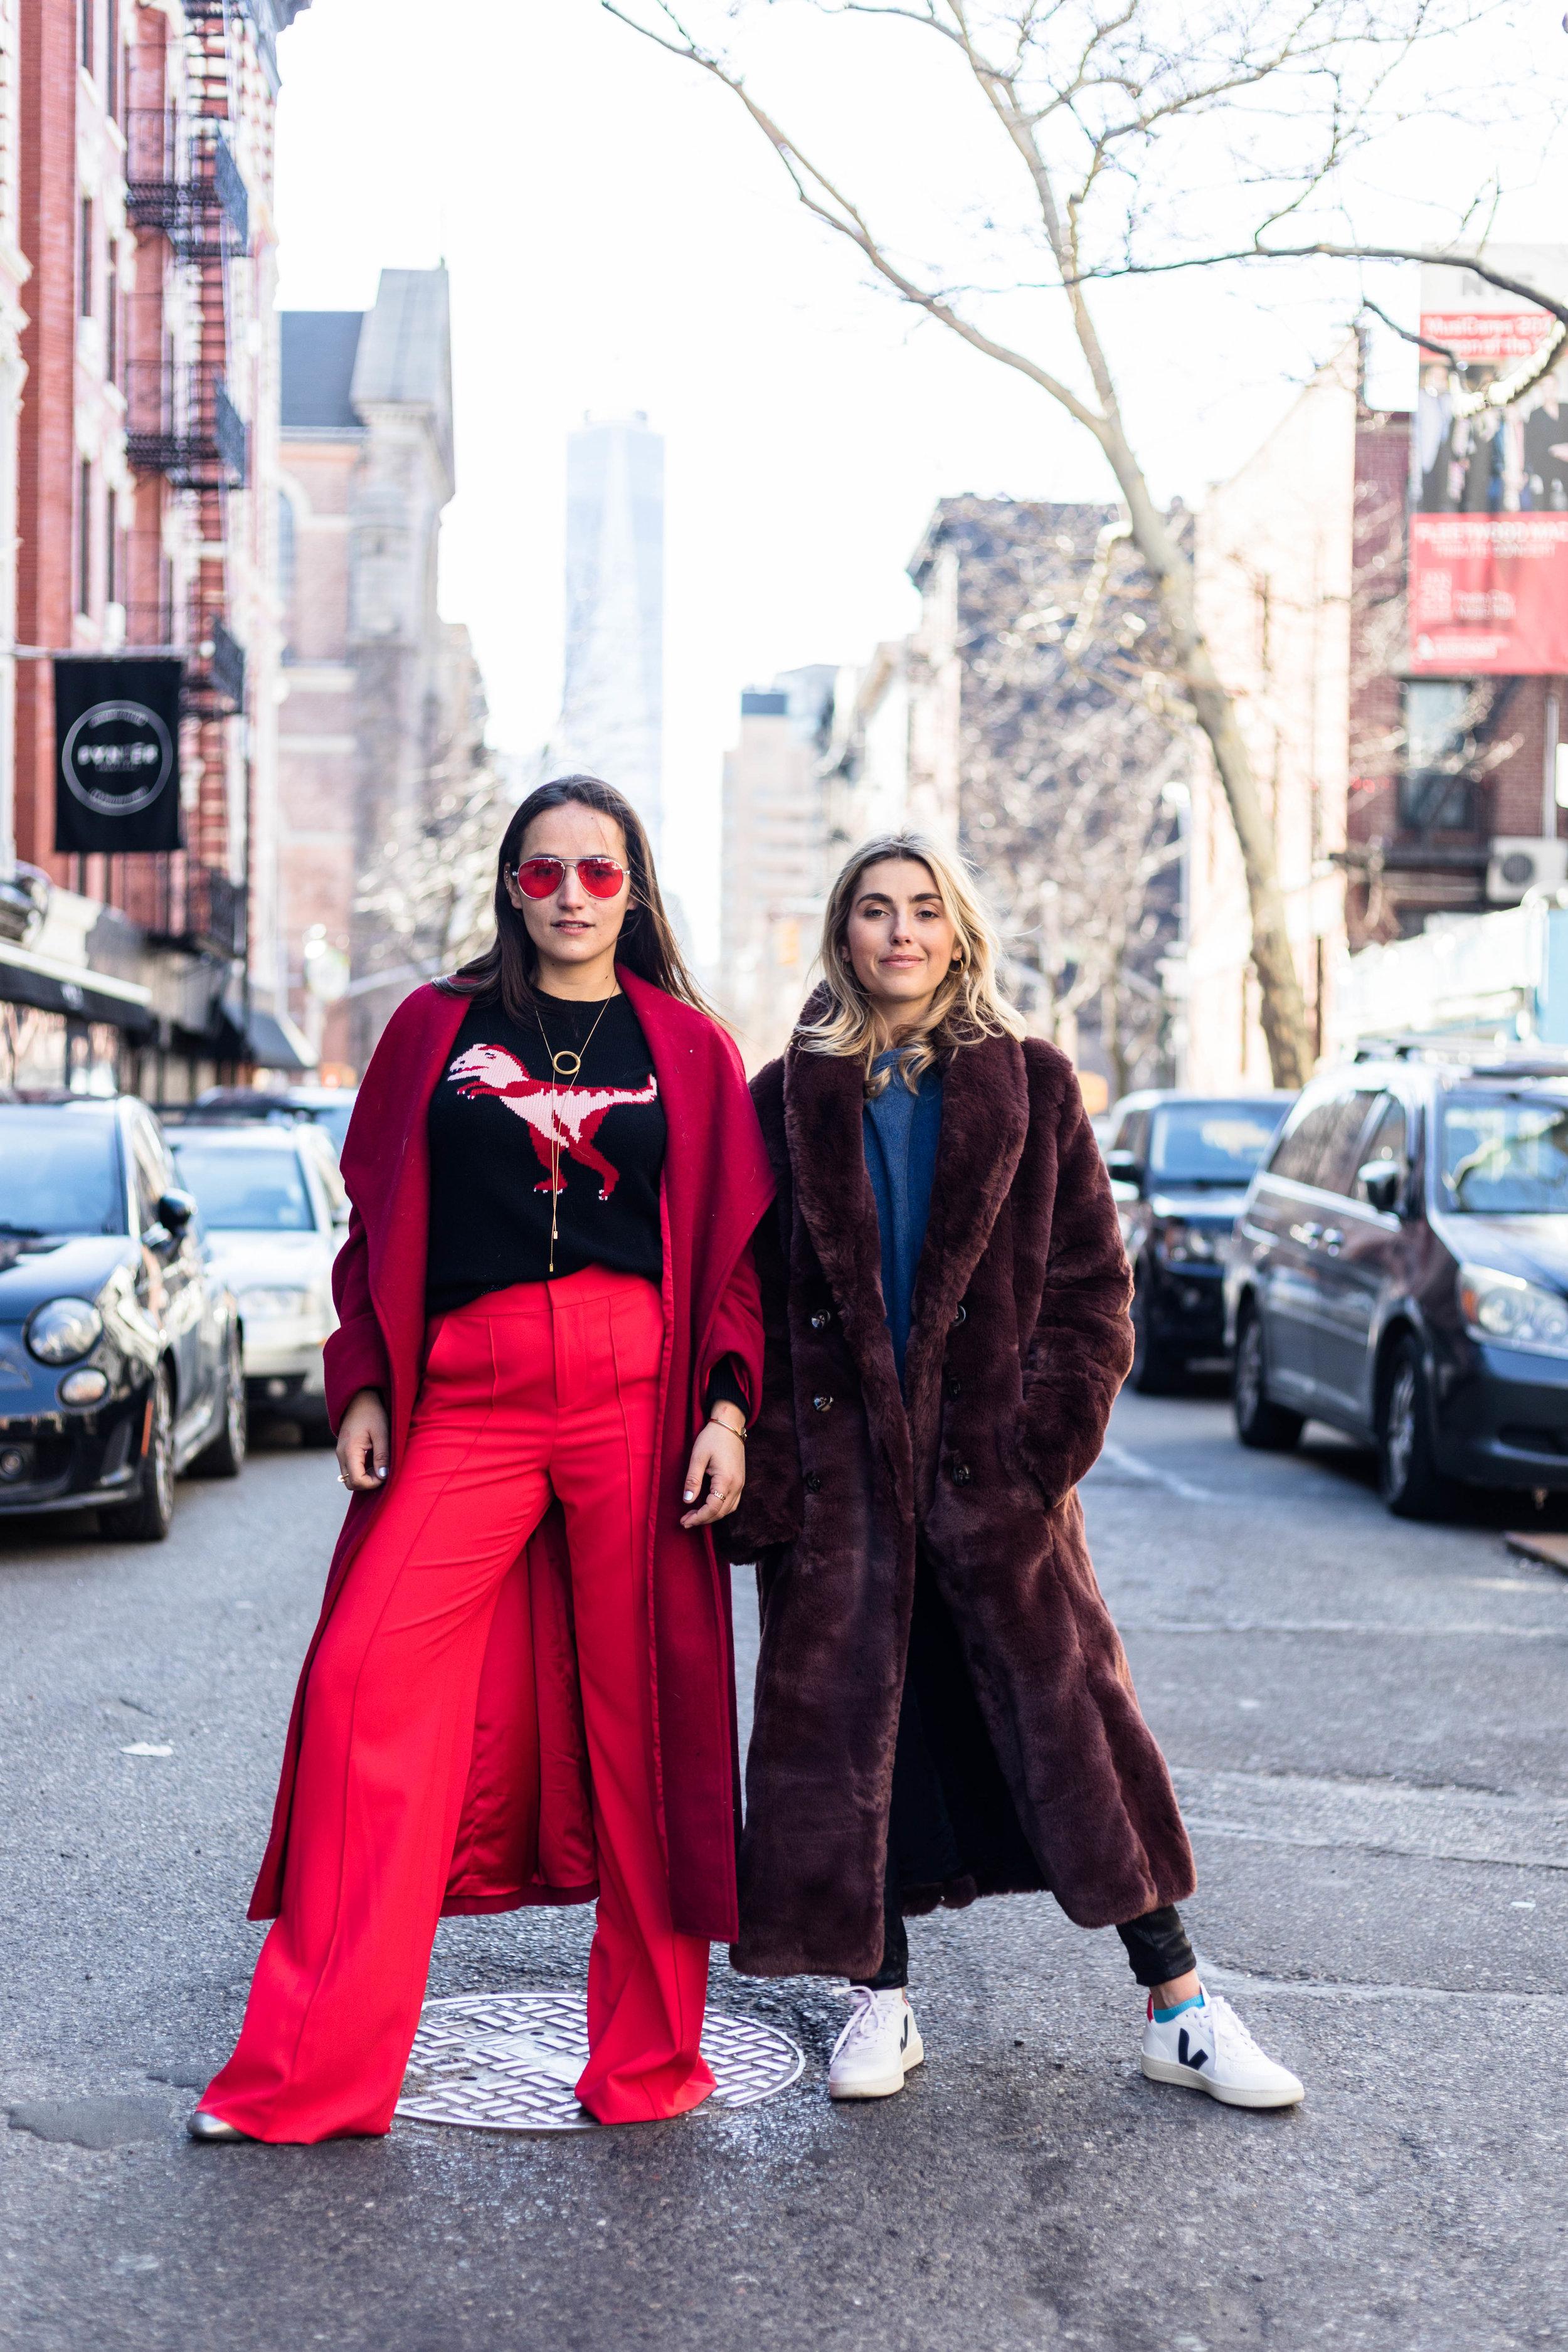 YIN 2MY YANG SOPHIE & CHARLOTTE BICKLEY BLOGGER SISTERS NYC LONG JACKET POST JANUARY 2018 1